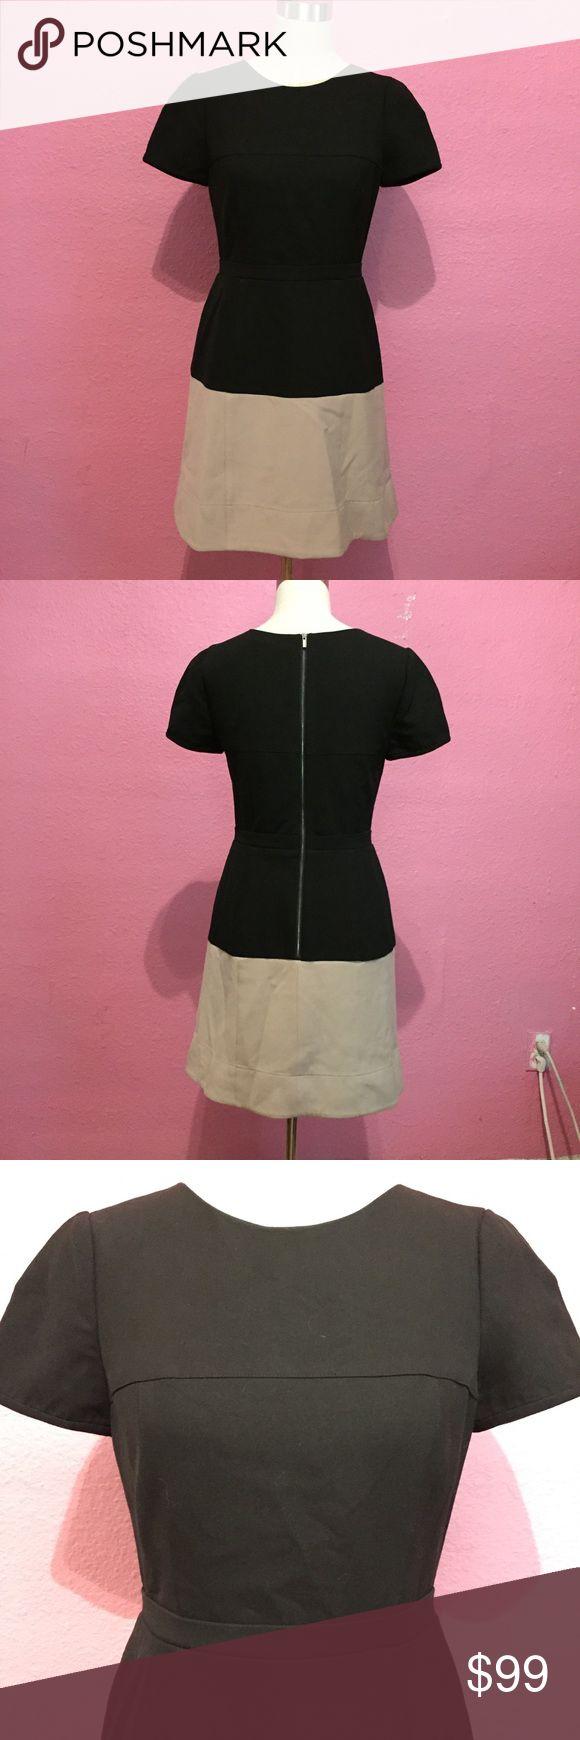 BCBGMaxazria dress color block career dress BCBGMaxazria dress color block career dress BCBGMaxAzria Dresses